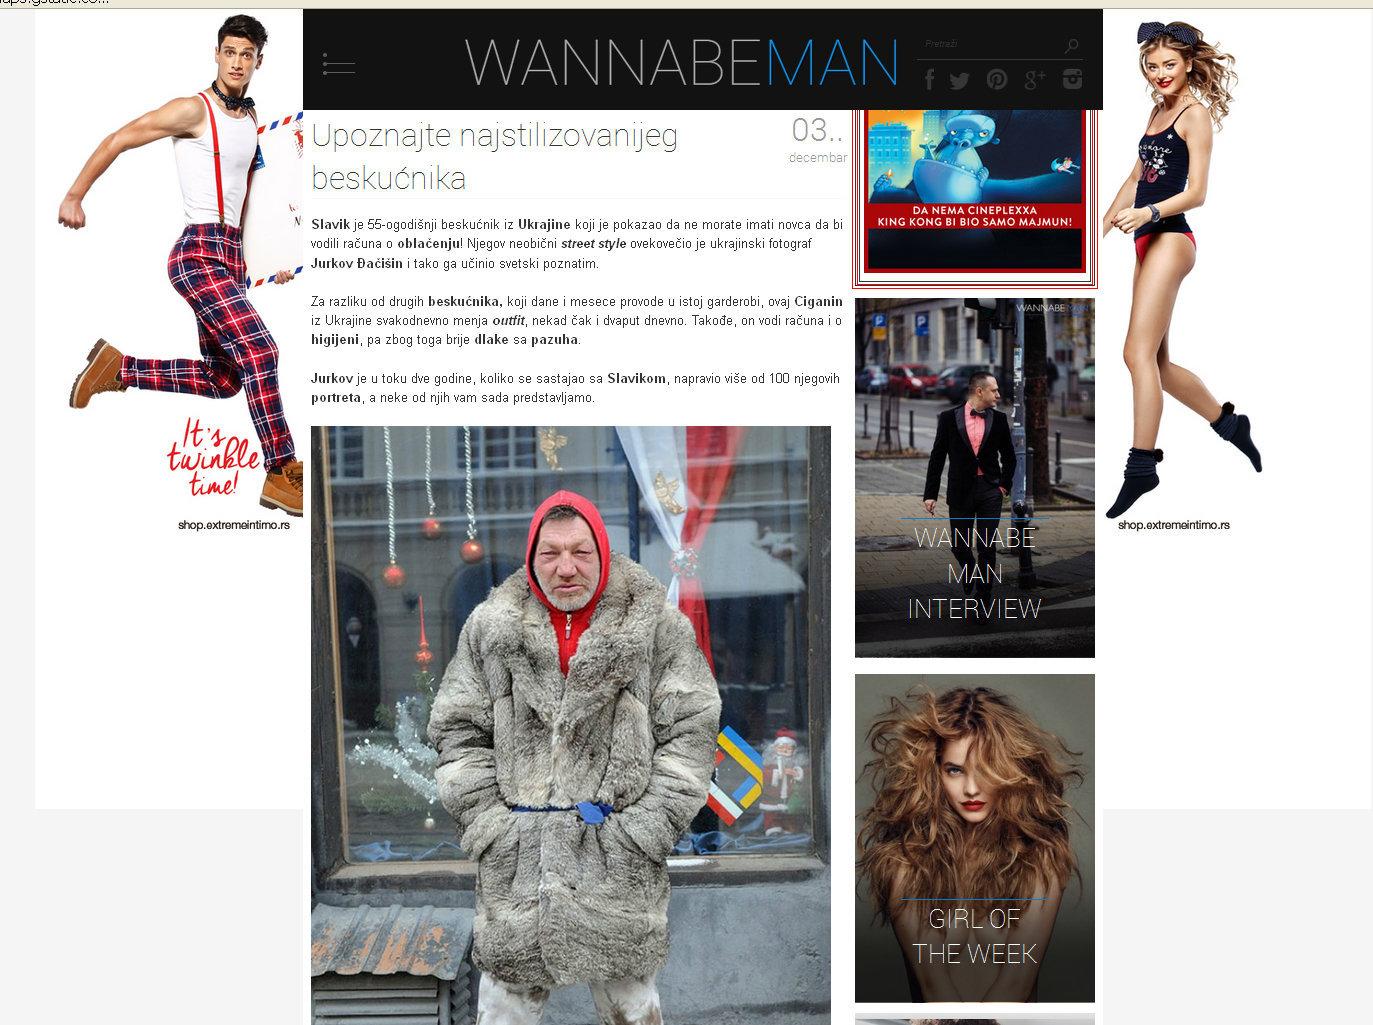 man_wannabemagazine_com.jpg